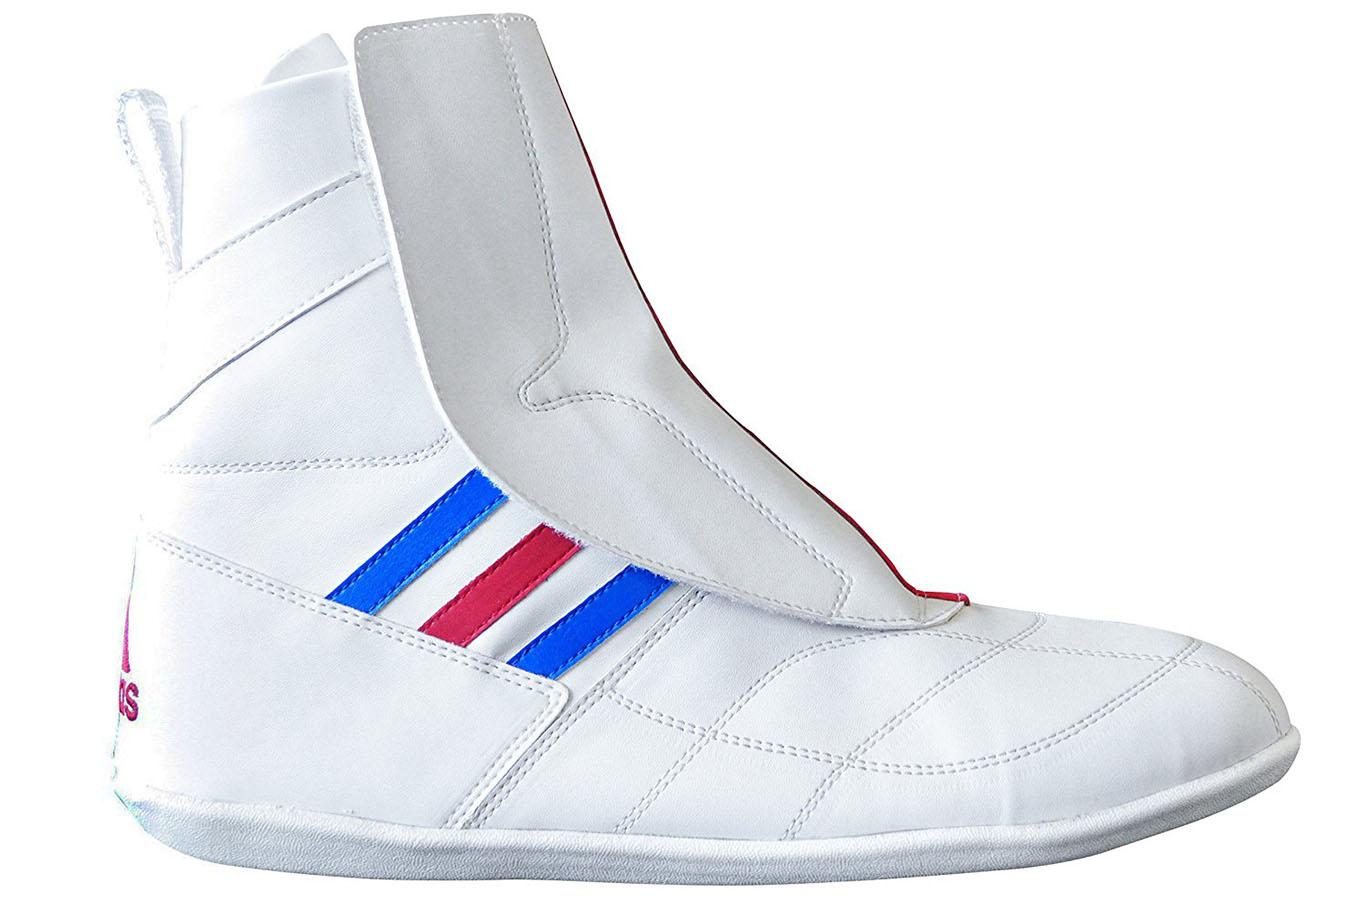 Chaussures Boxe Française, Adidas ADISFB03